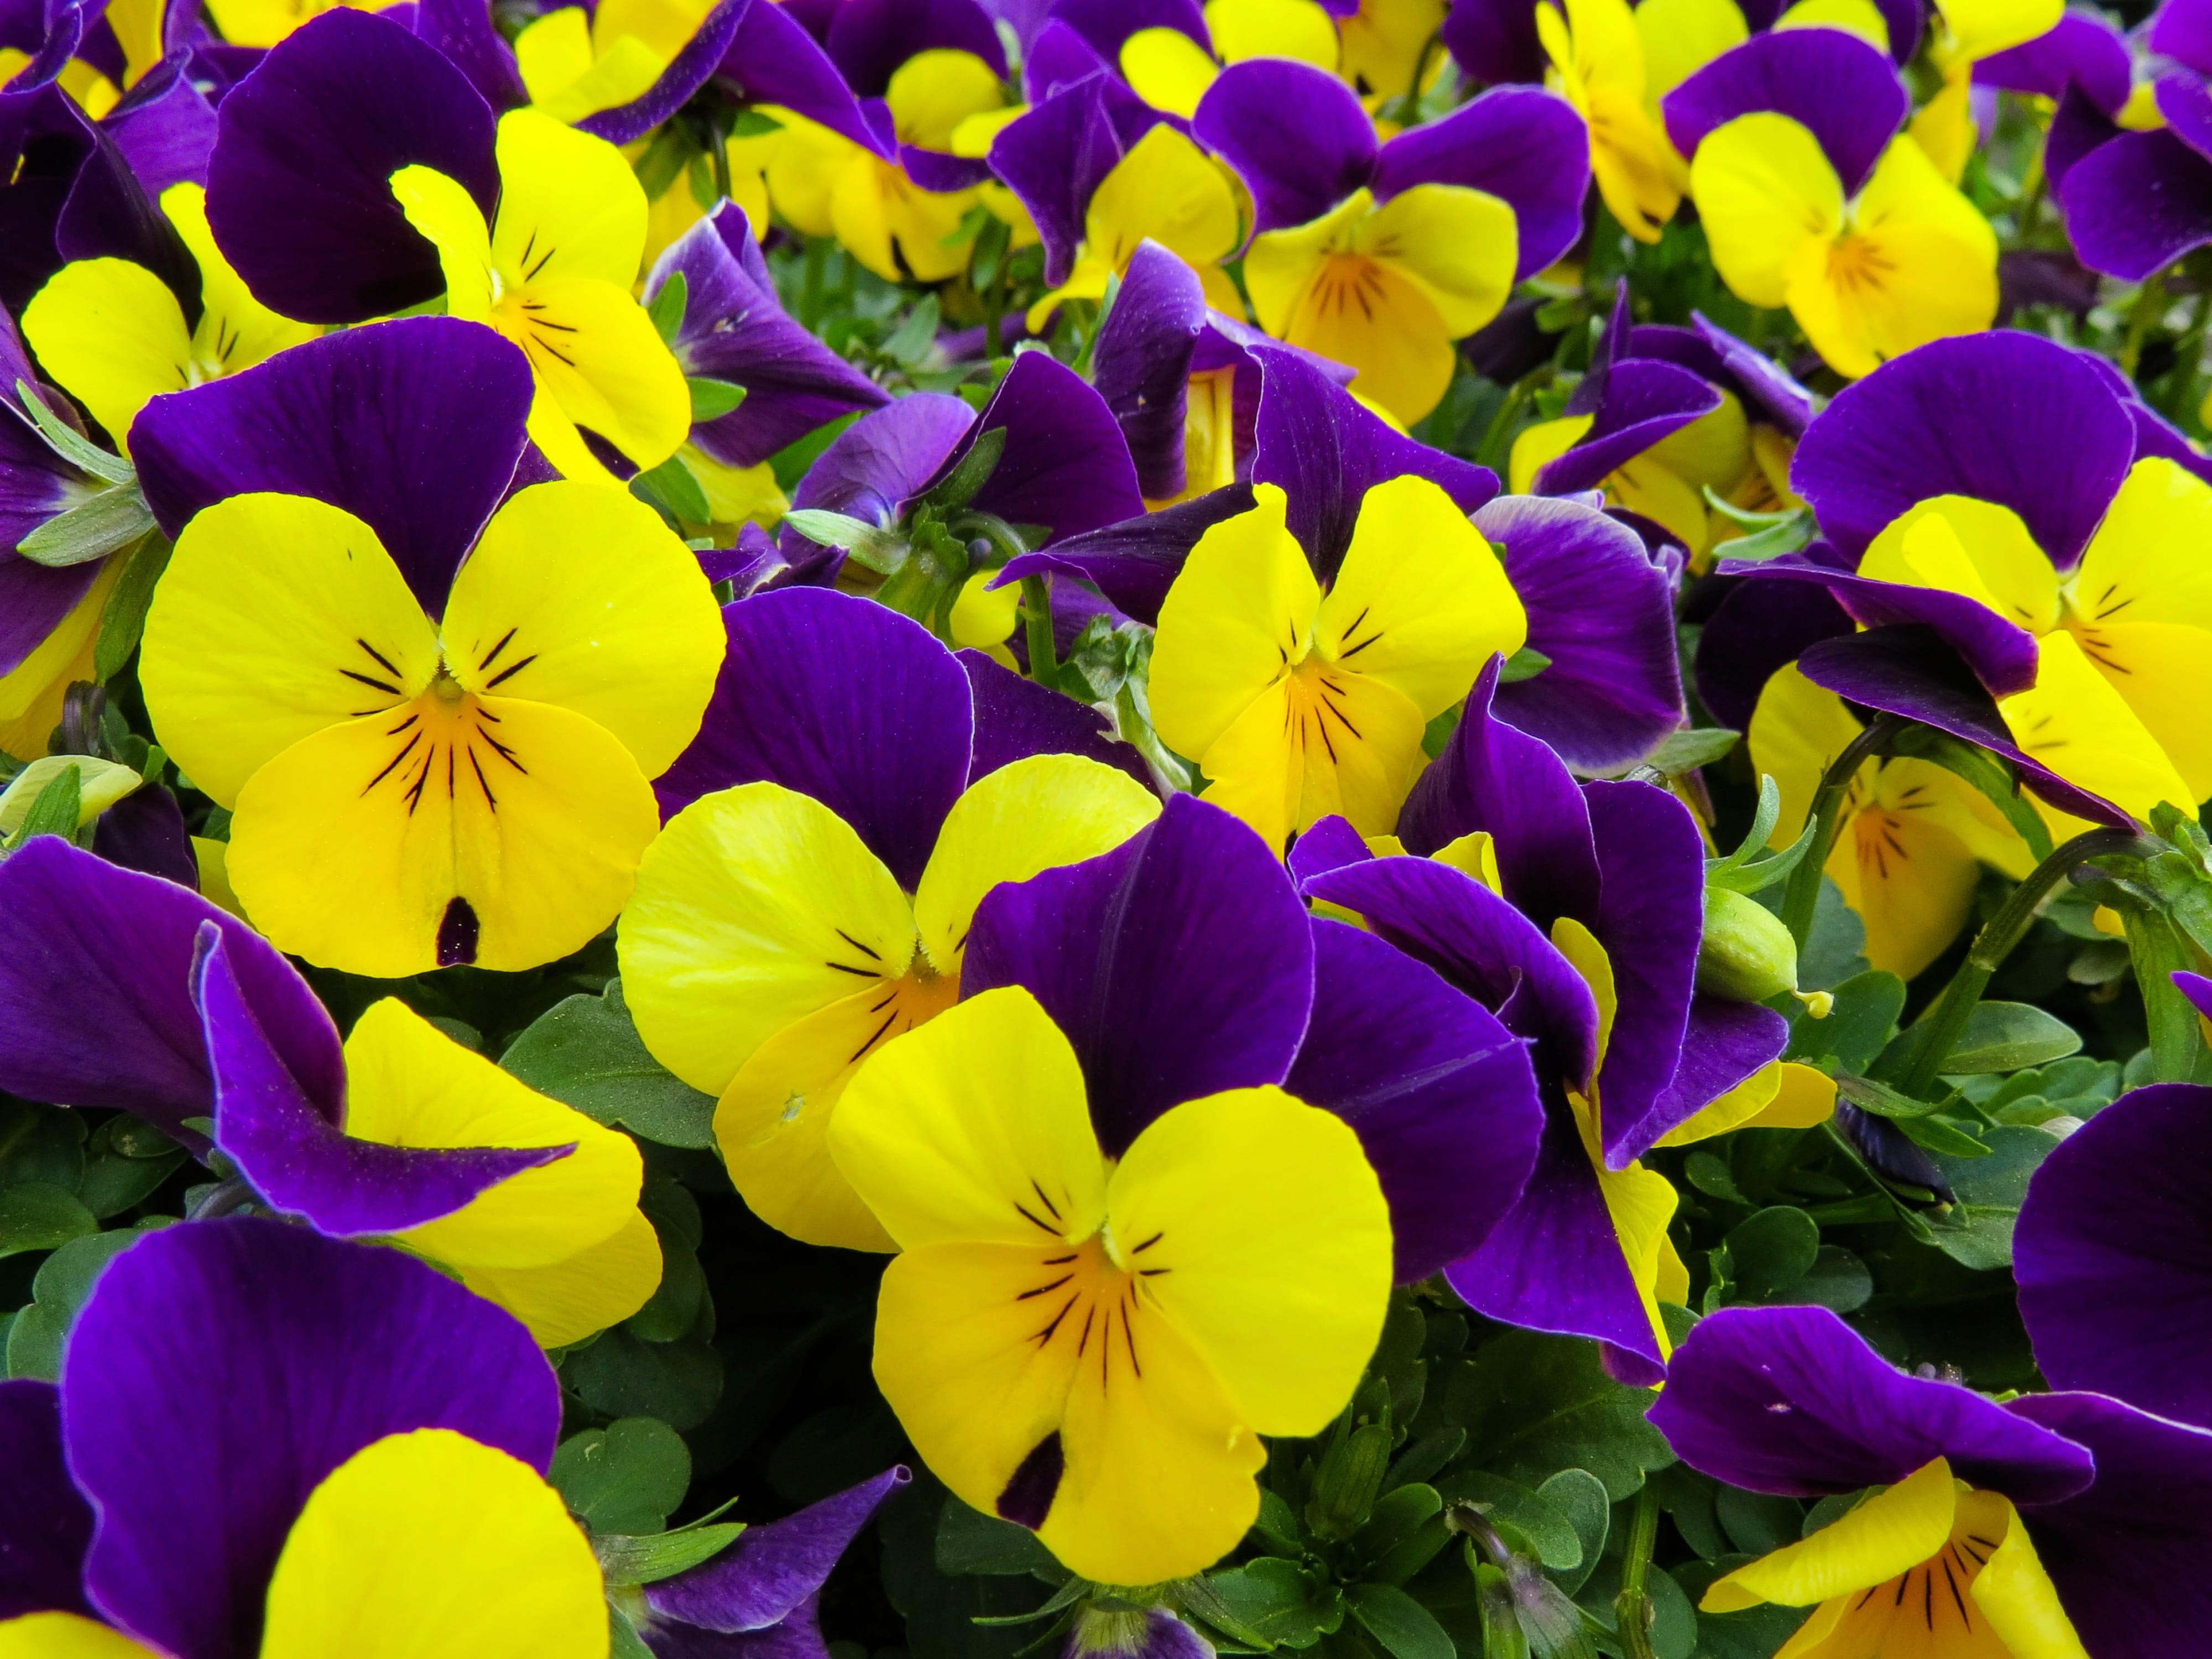 violas yellow and purple